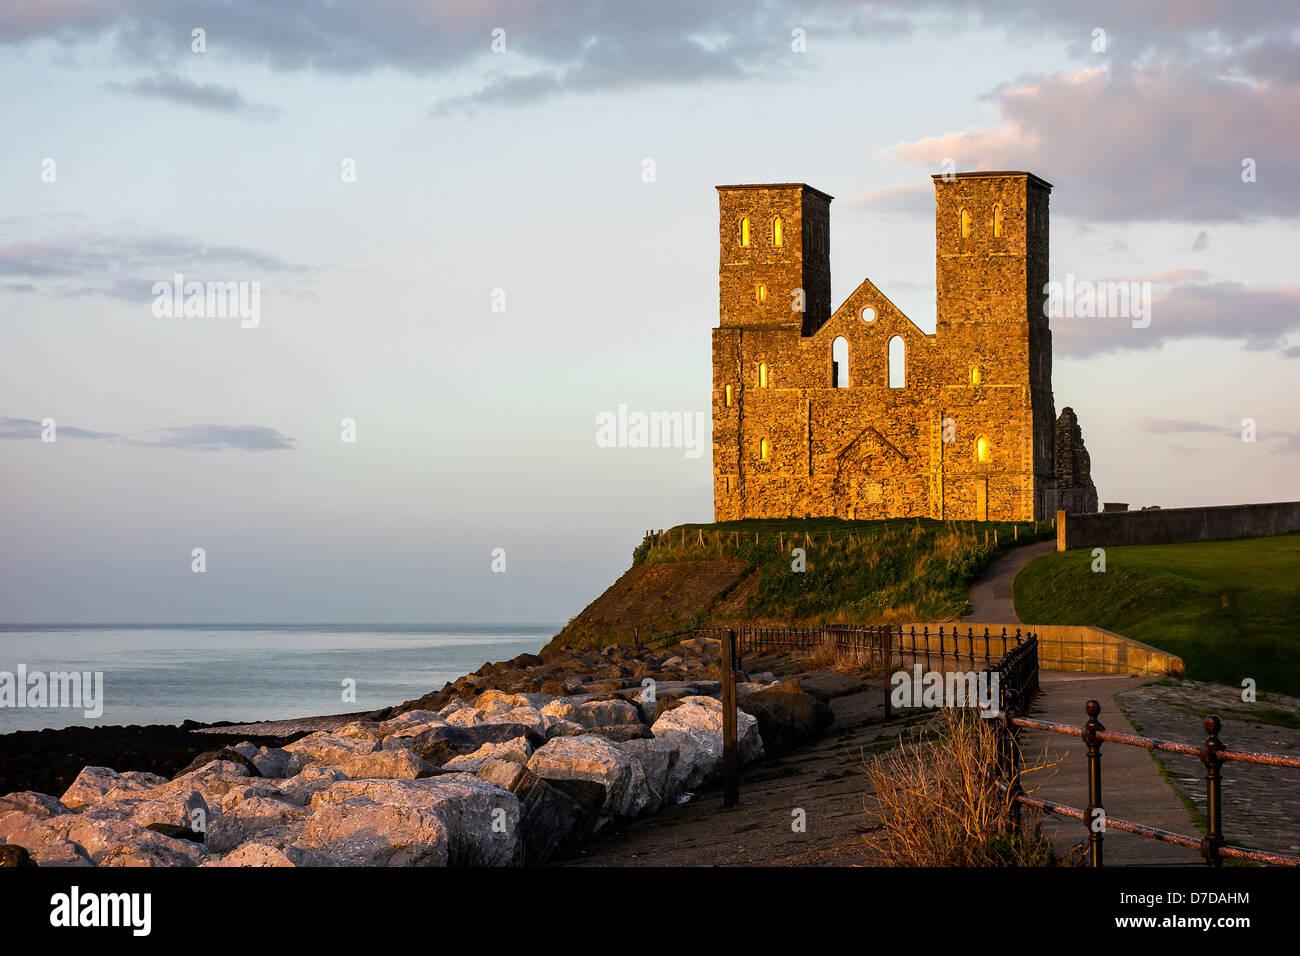 Reculver Towers Herne Bay Kent England at Sunset Stock Photo